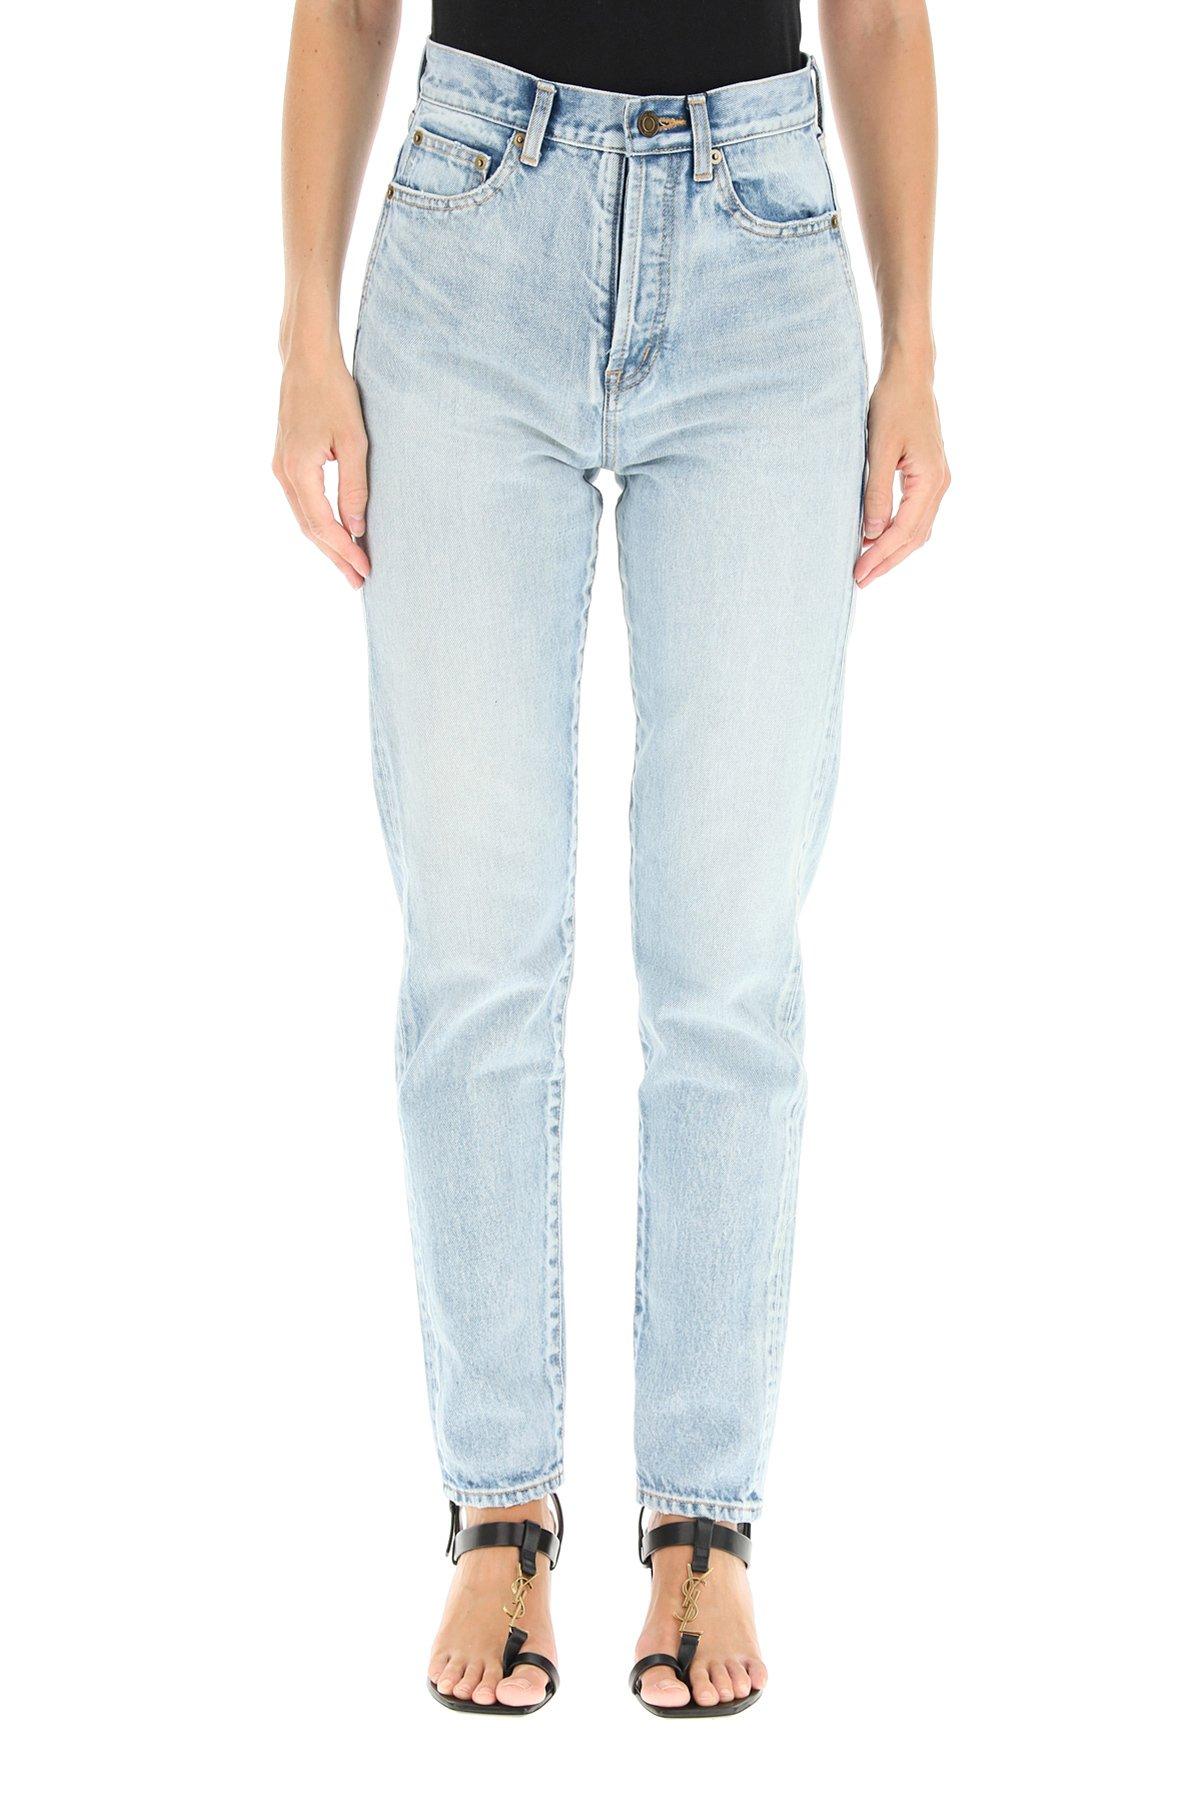 Saint laurent jeans slim serge light blue